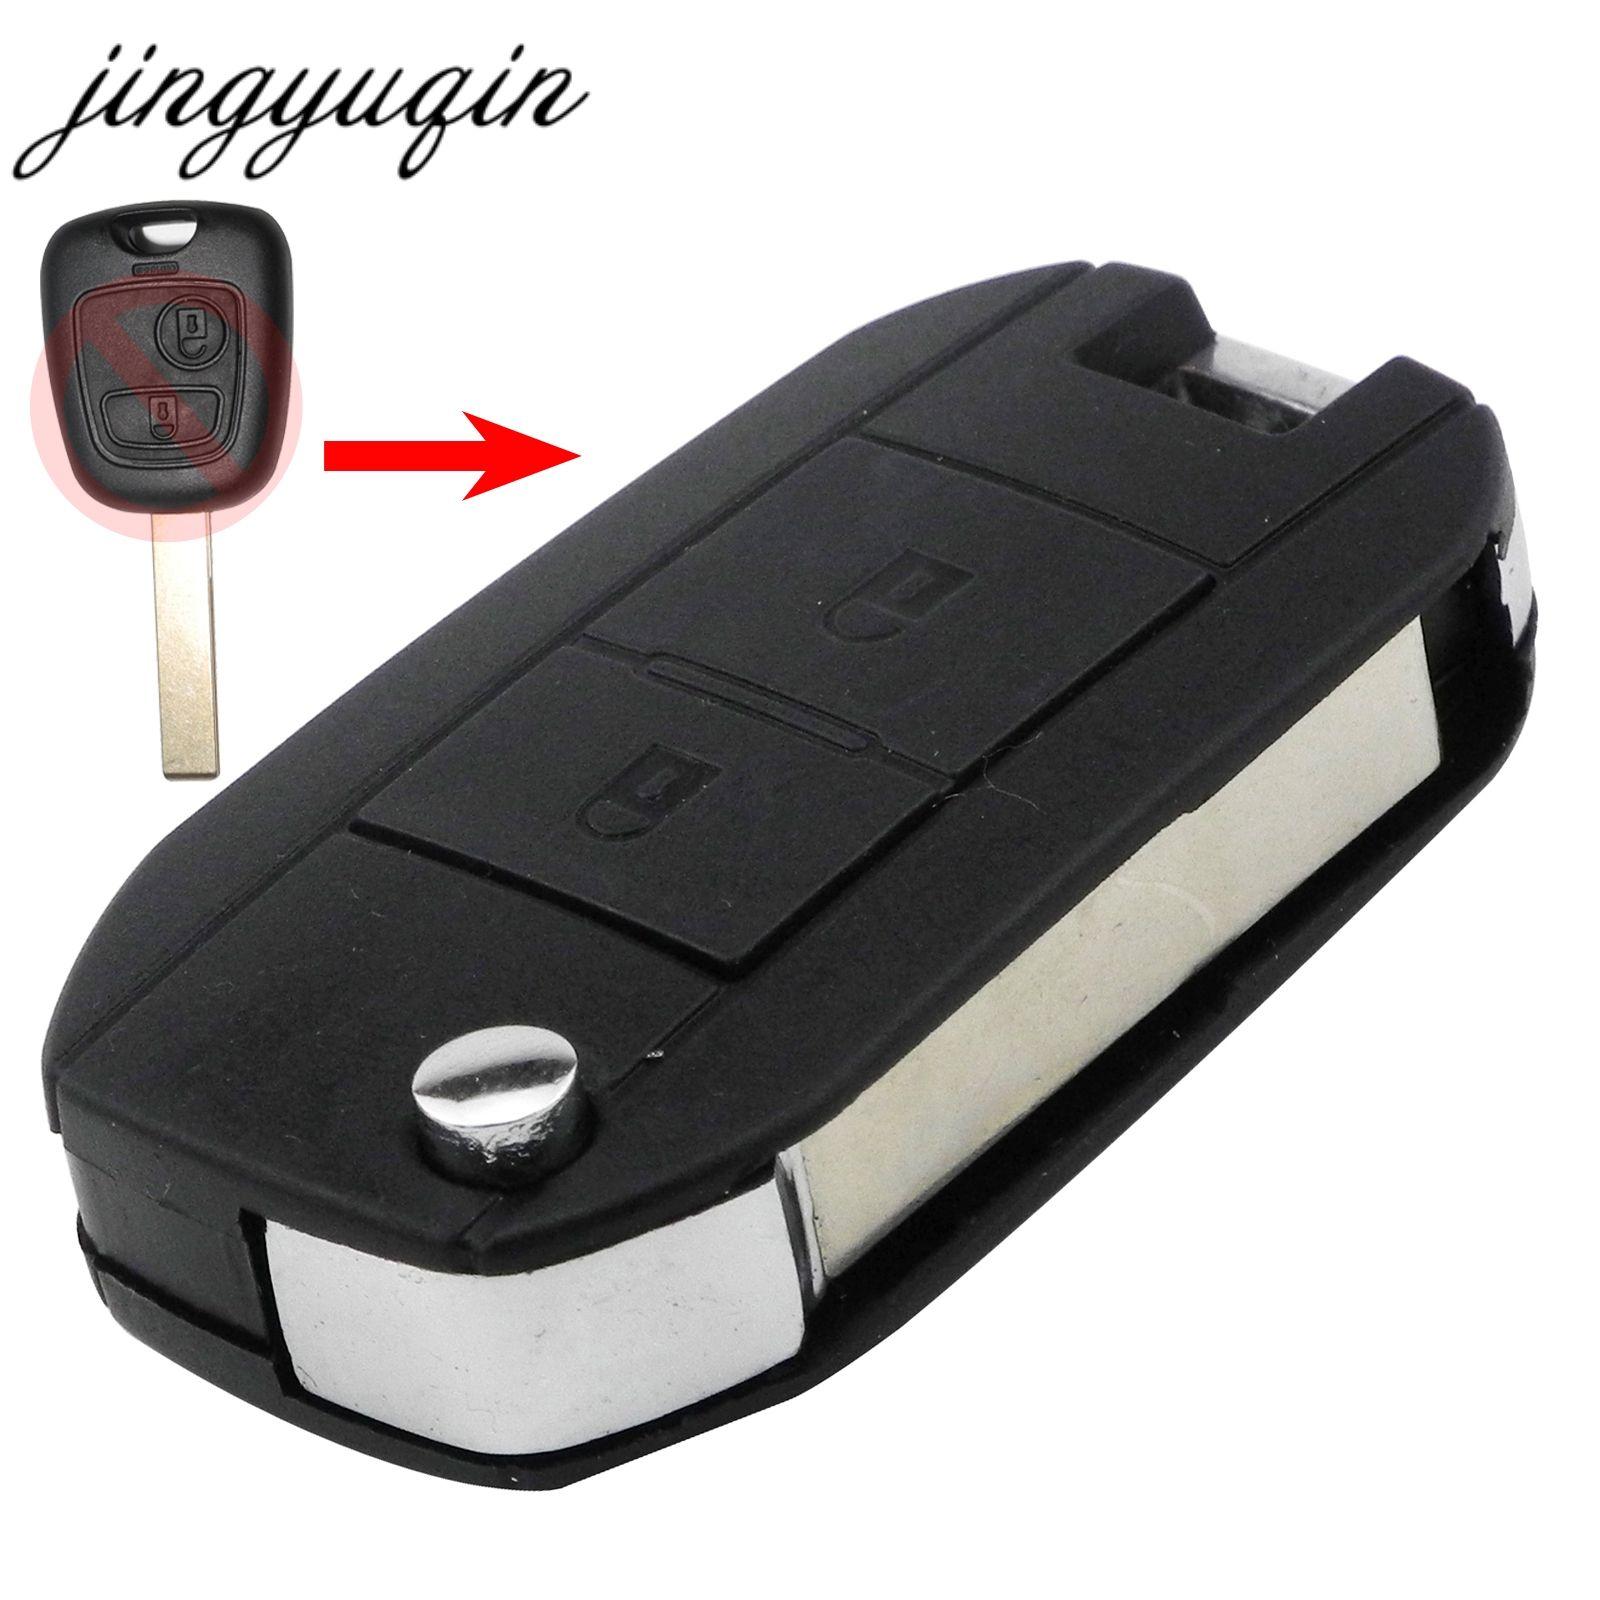 Jingyuqin Für Citroen C1 C2 C3 Pluriel C4 C5 C8 Xsara Picasso VA2/HCA Klinge 2-Taste Flip Geändert auto Schlüssel Shell Remote Fall